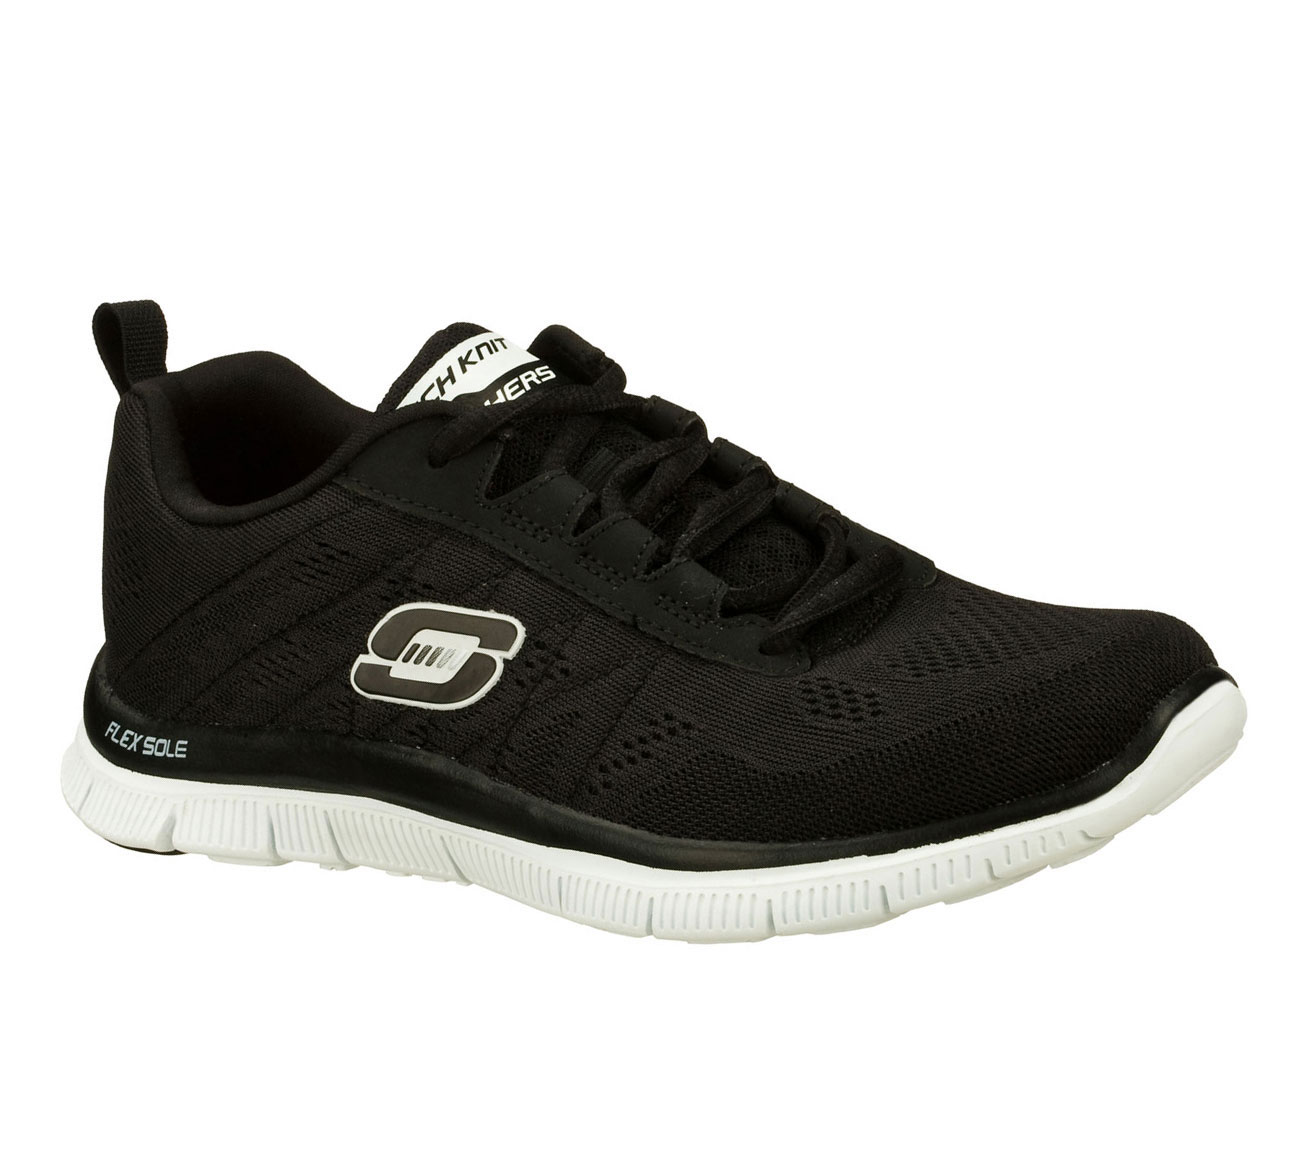 Sketcher Flex Black Shoes